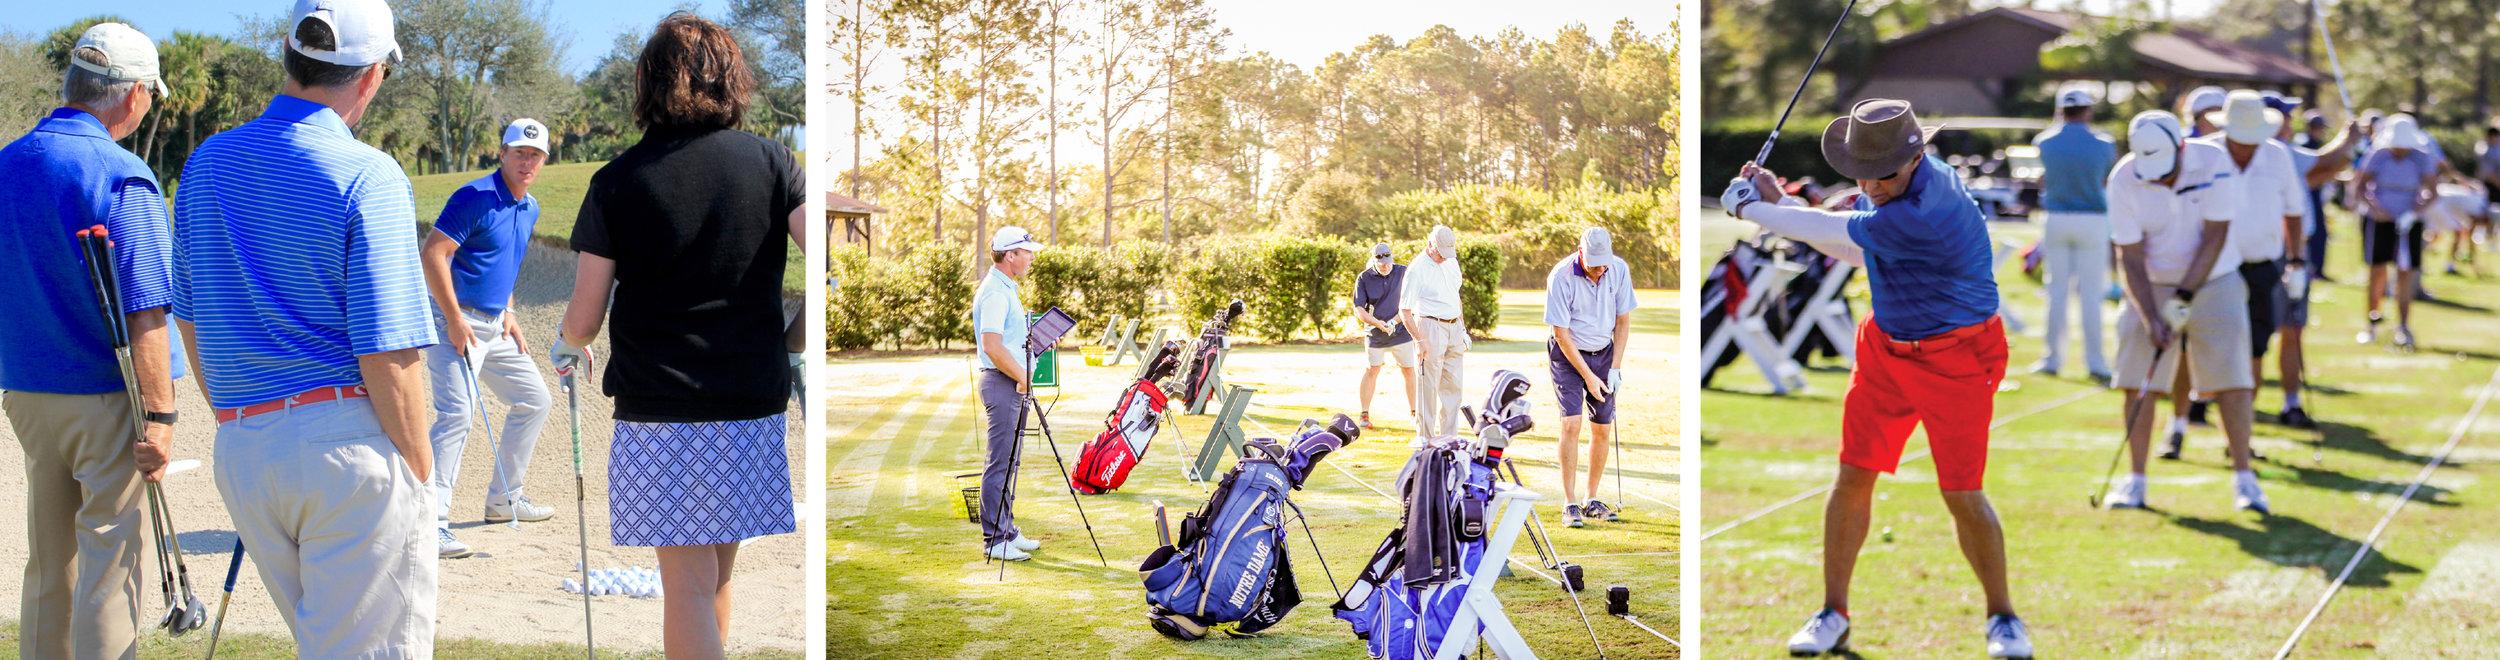 Offsite-Banner-Golf-School.jpg